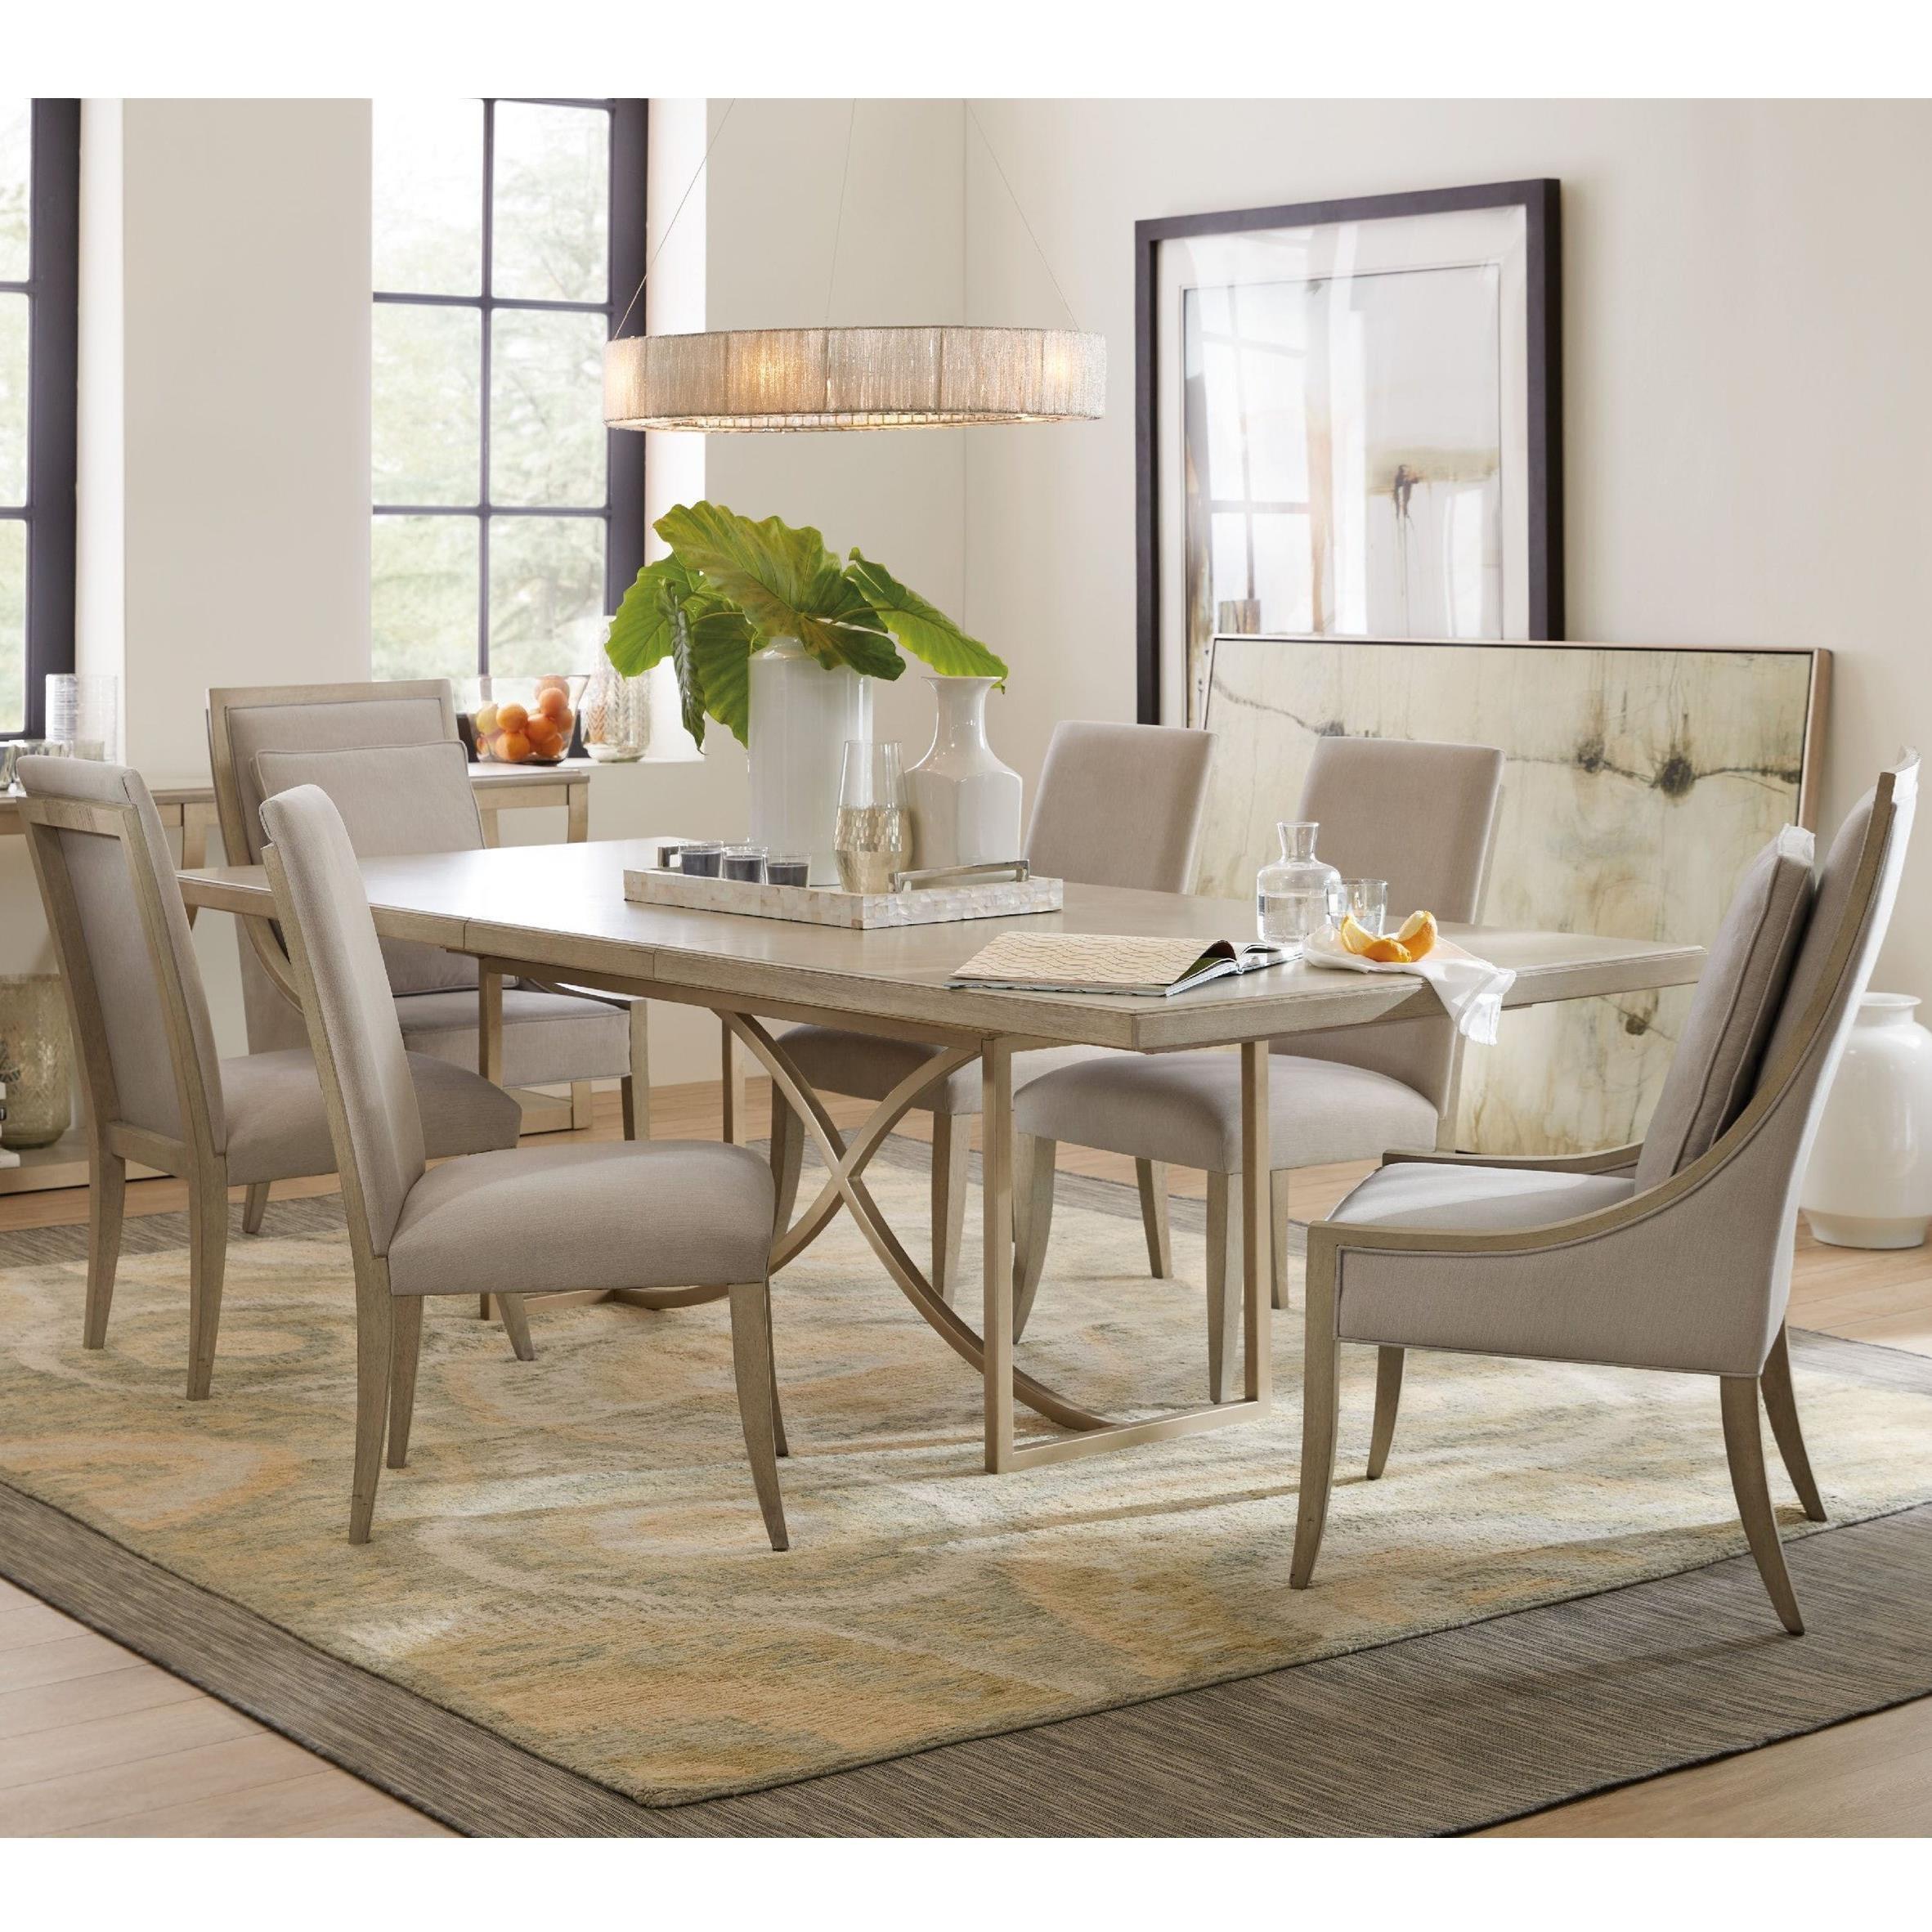 Elixir 7 Piece Dining Set by Hooker Furniture at Miller Waldrop Furniture and Decor